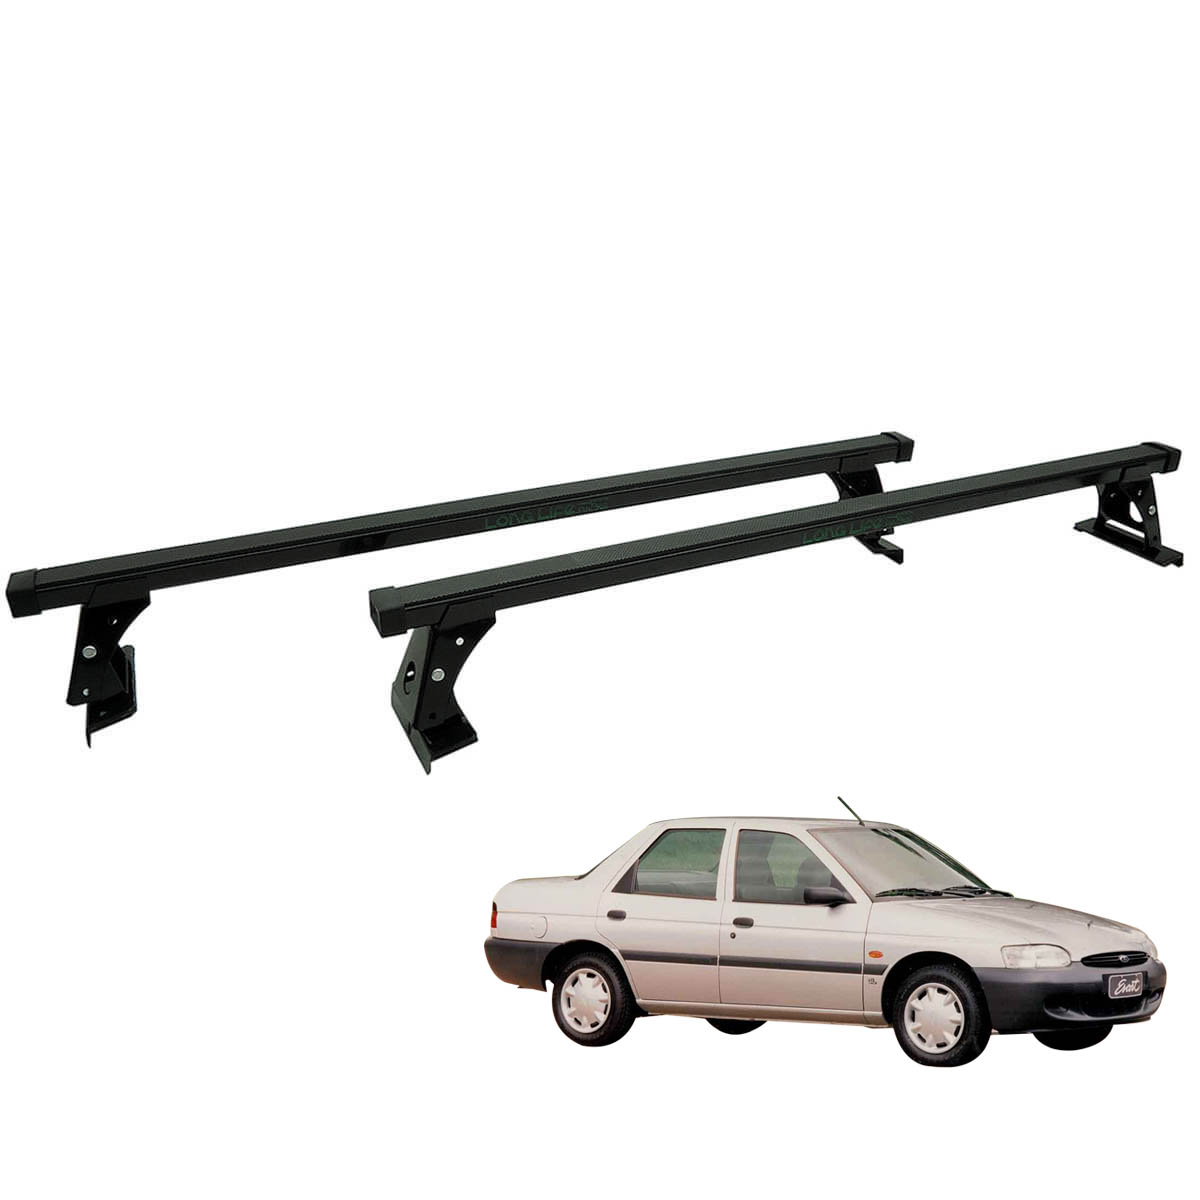 Rack de teto Escort, Pointer ou Verona 4 portas a partir de 1993 Long Life aço